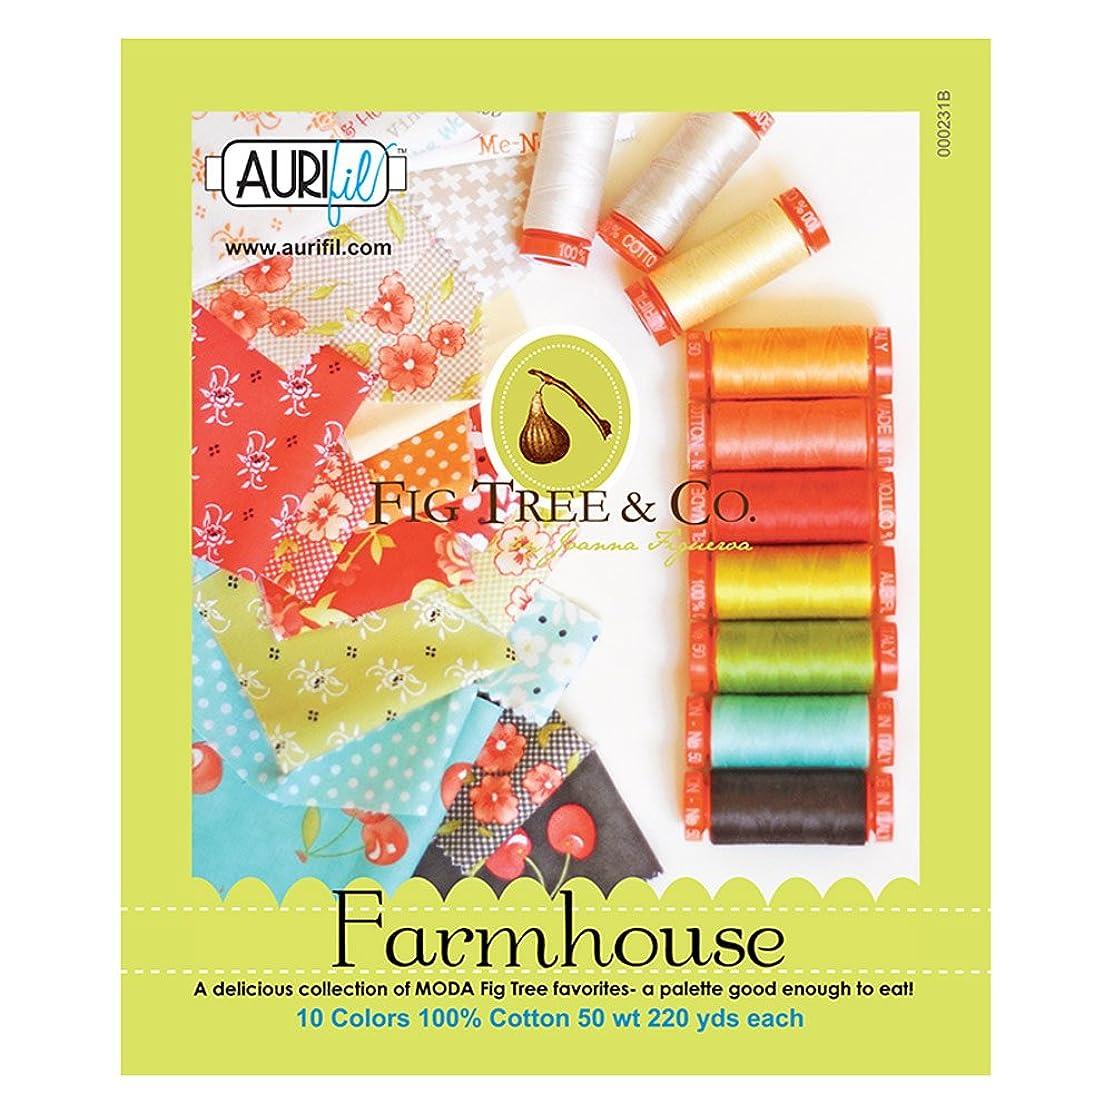 Farmhouse by Fig Tree Thread Kit 50wt 10 Small (220 yard) Spools Aurifil